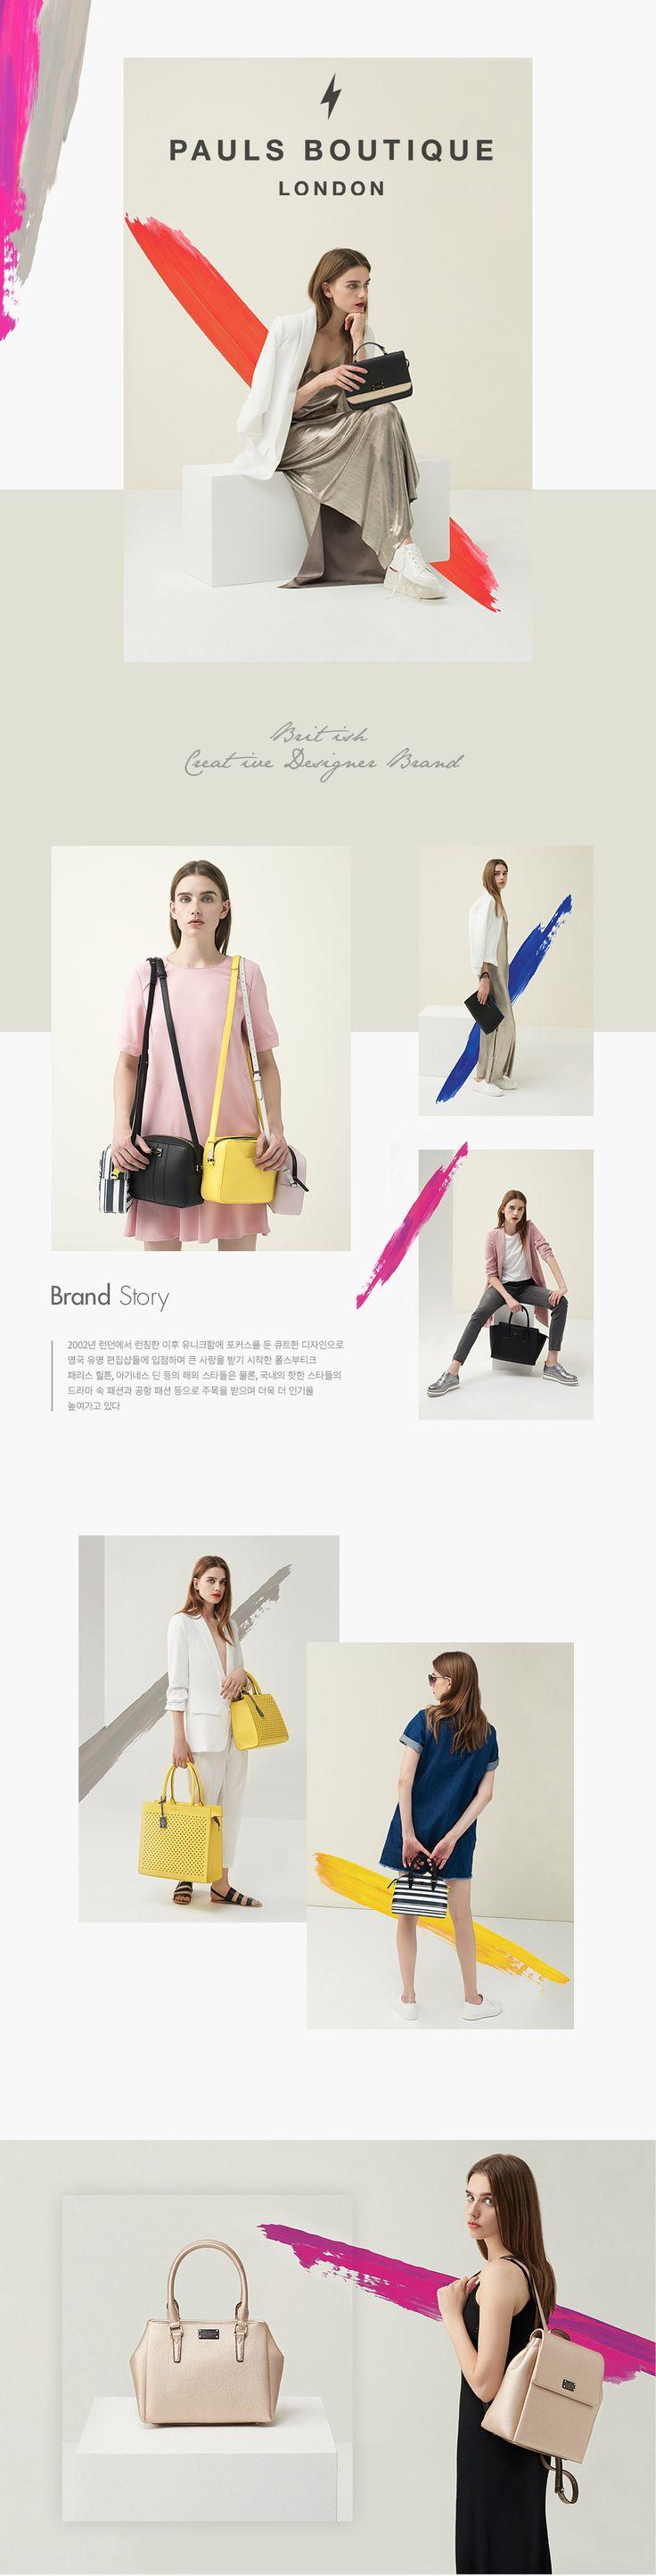 WIZWID:위즈위드 - 글로벌 쇼핑 네트워크여성 의류 가방 우먼 패션 백 기획전 PAUL'S BOUTIQUE 셀럽들의 잇 백 폴스 부티크 런칭세일+7%쿠폰 증정!